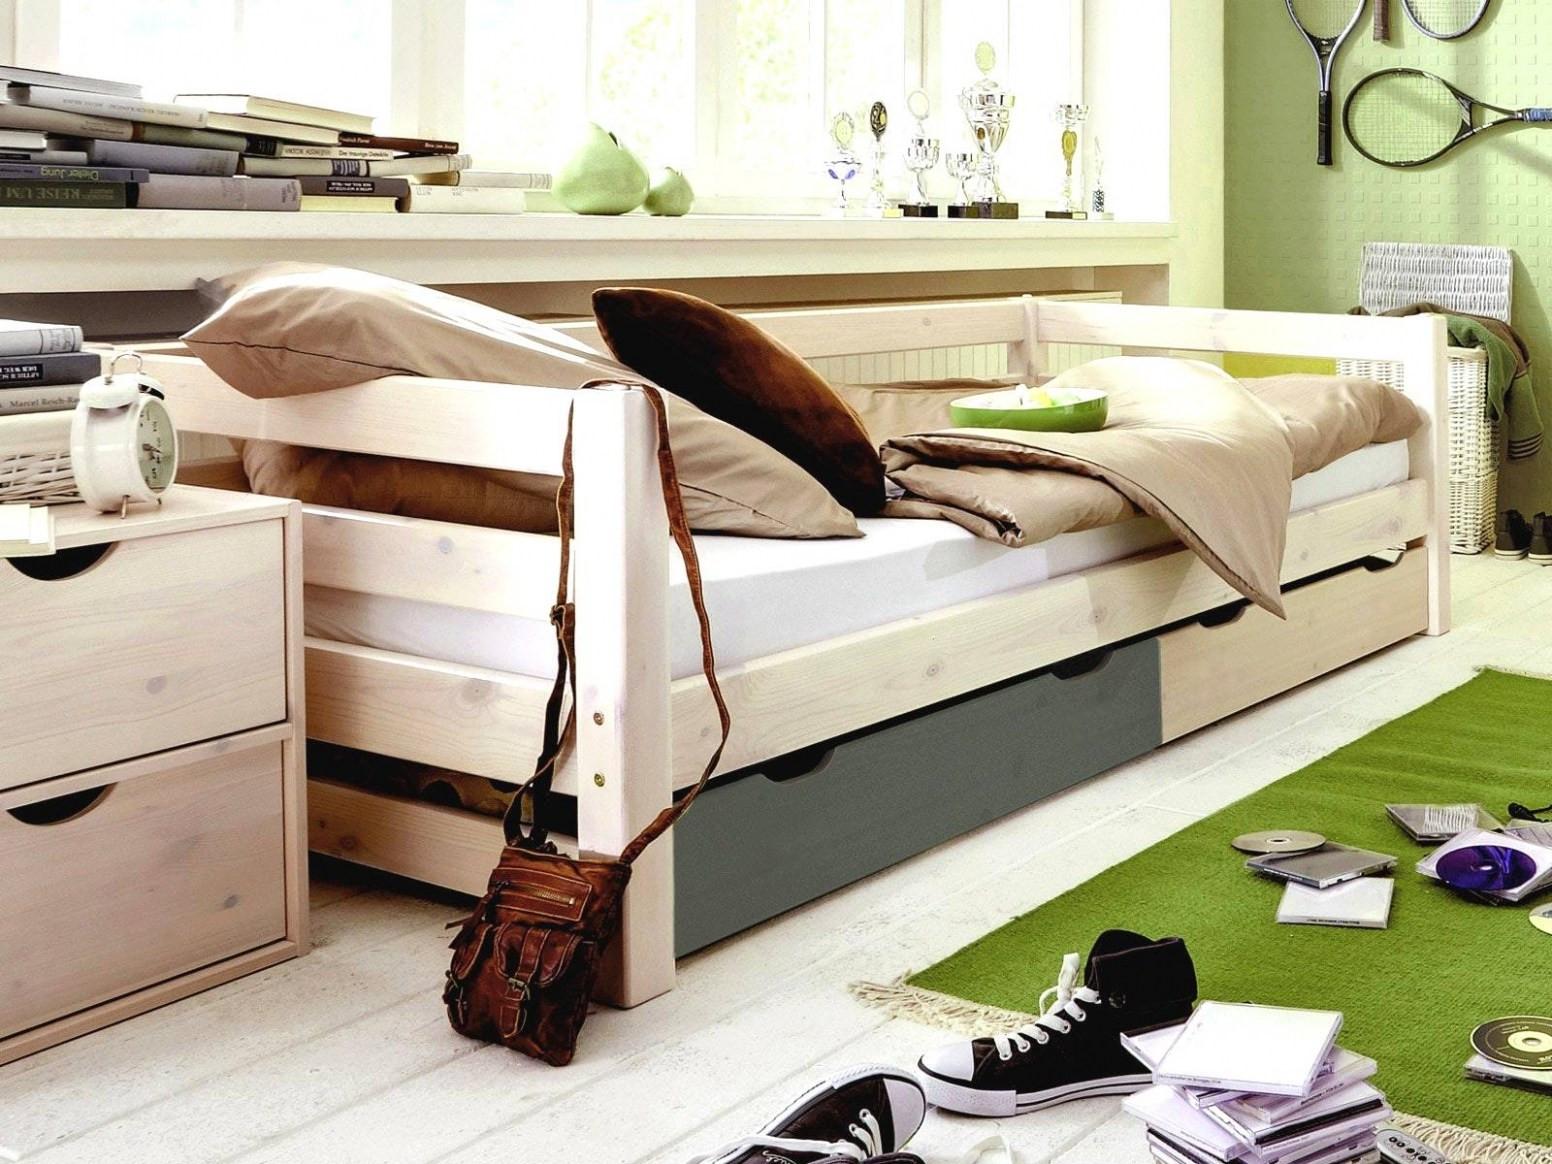 Coole Ausmalbilder Fur Teenager Frisch Coole Betten Für Teenager Sammlung